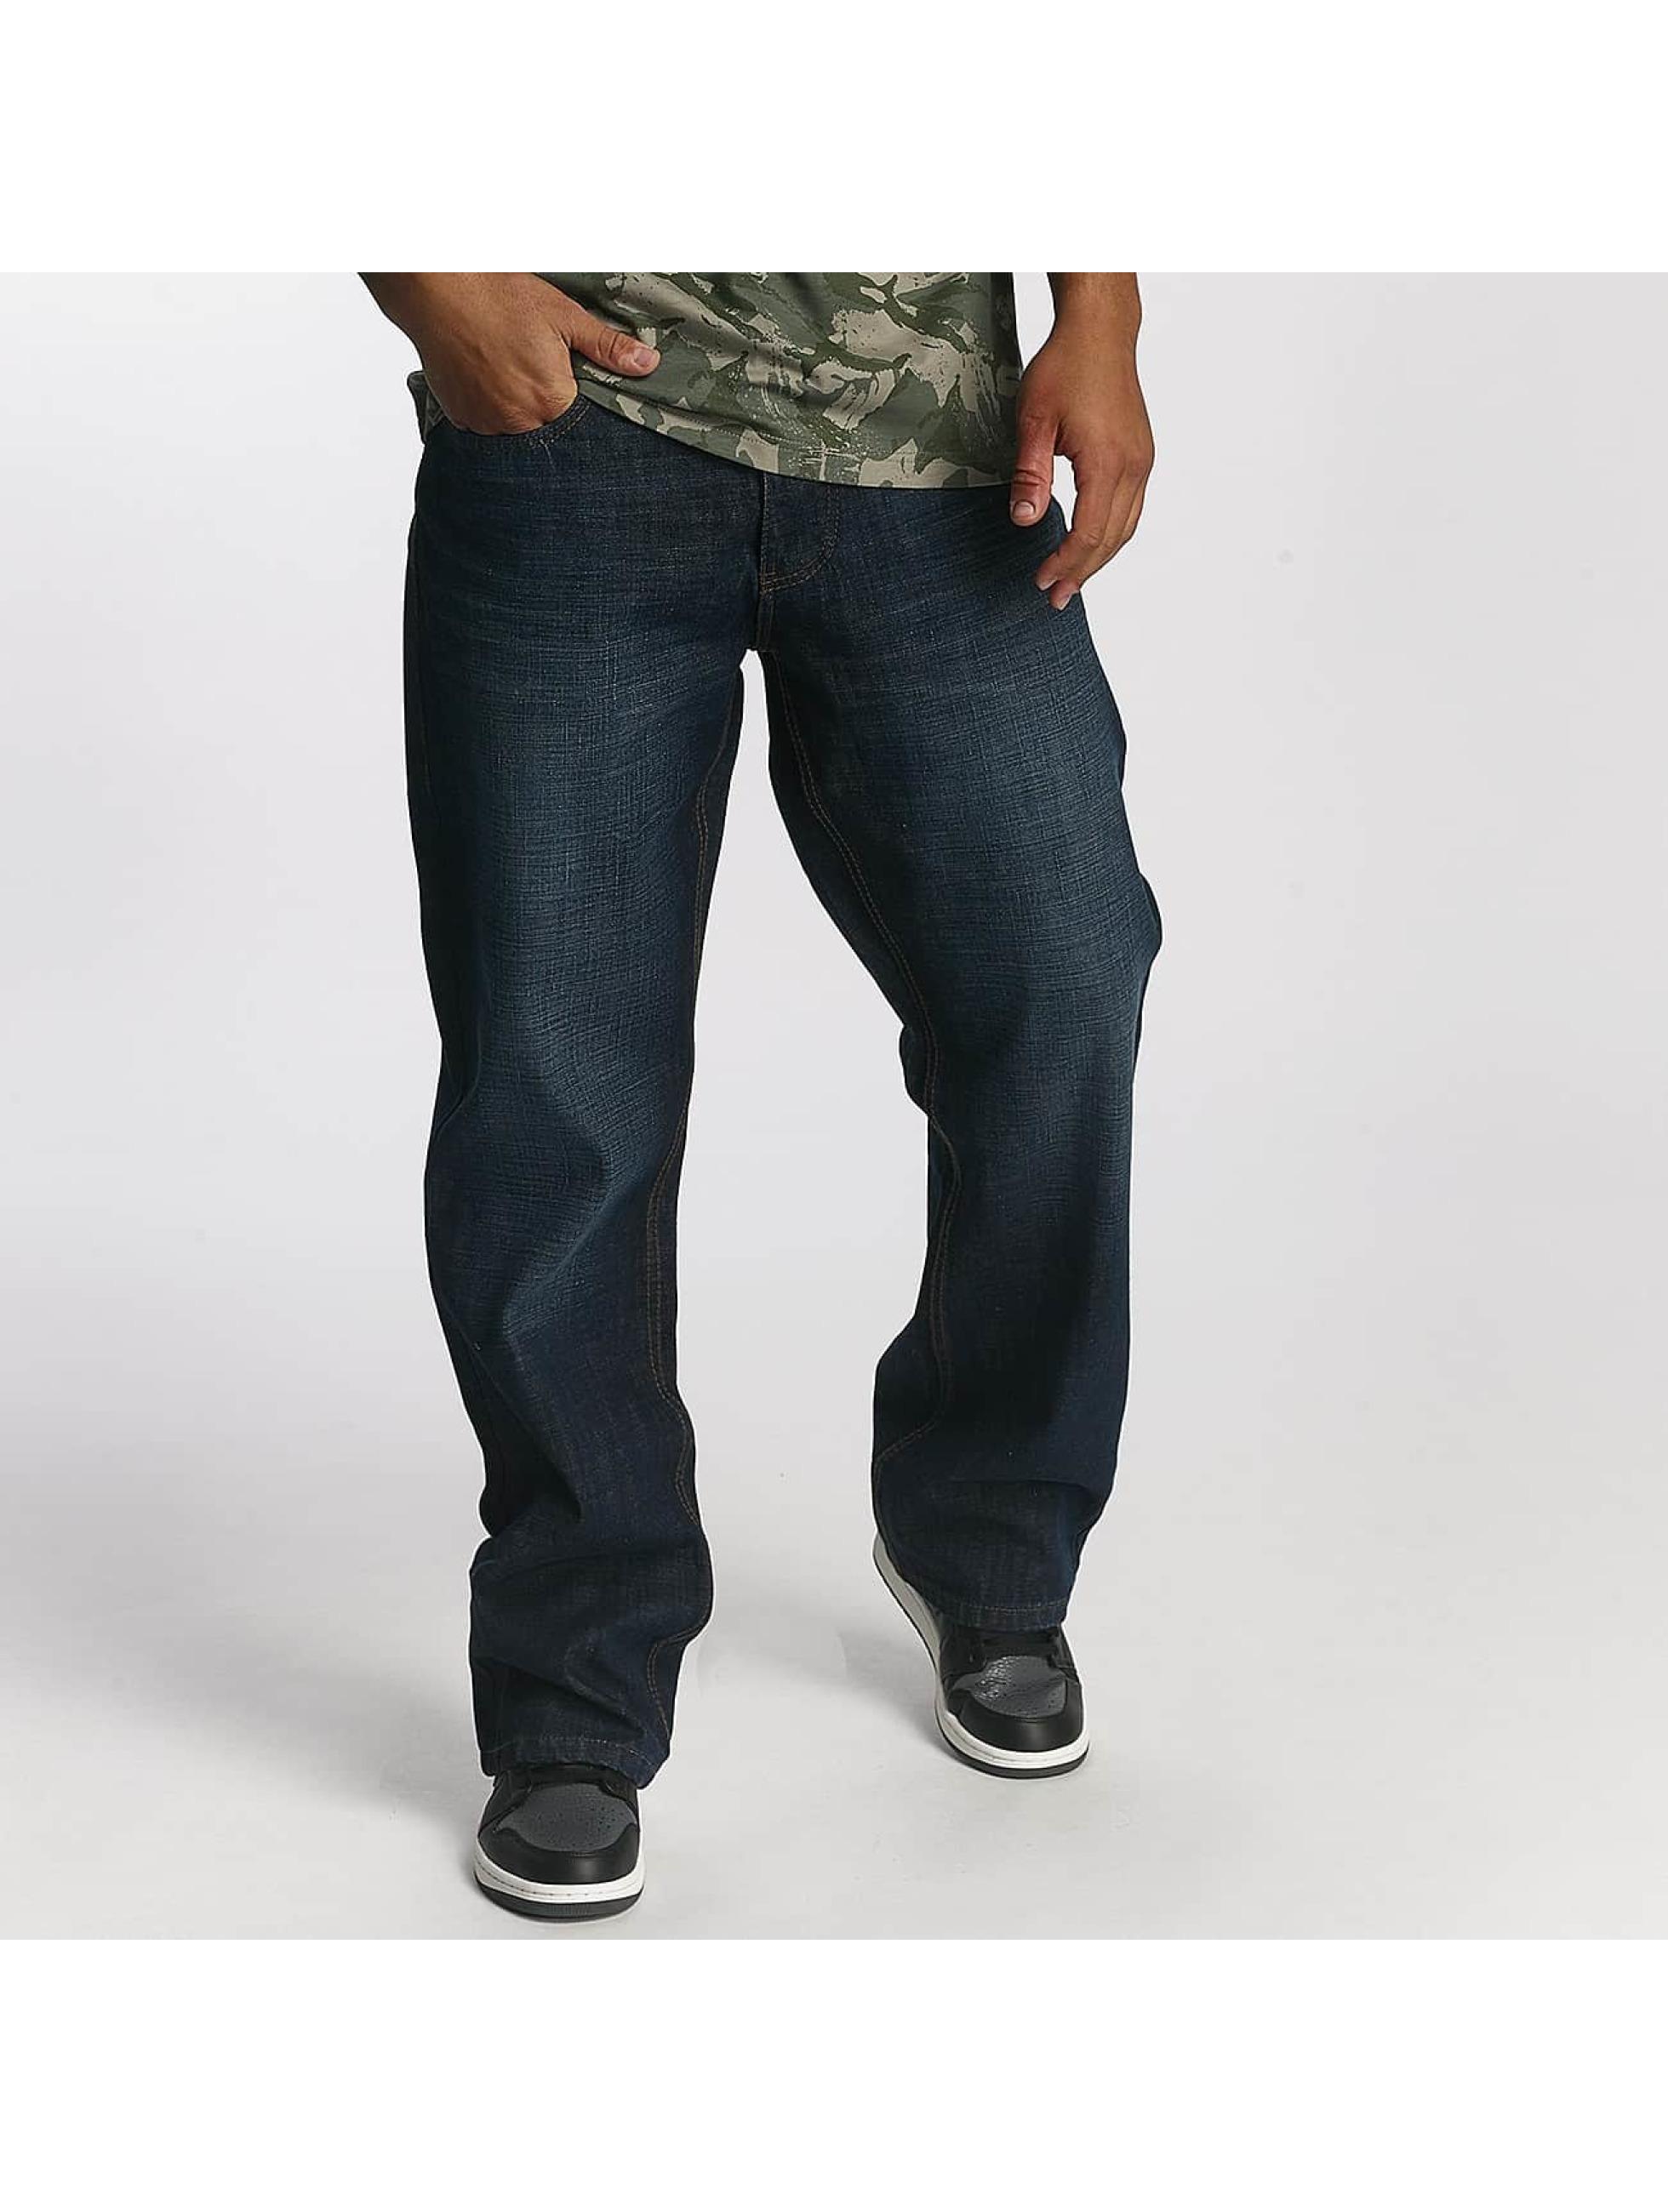 Rocawear / Loose Fit Jeans Loose Fit in blue W 42